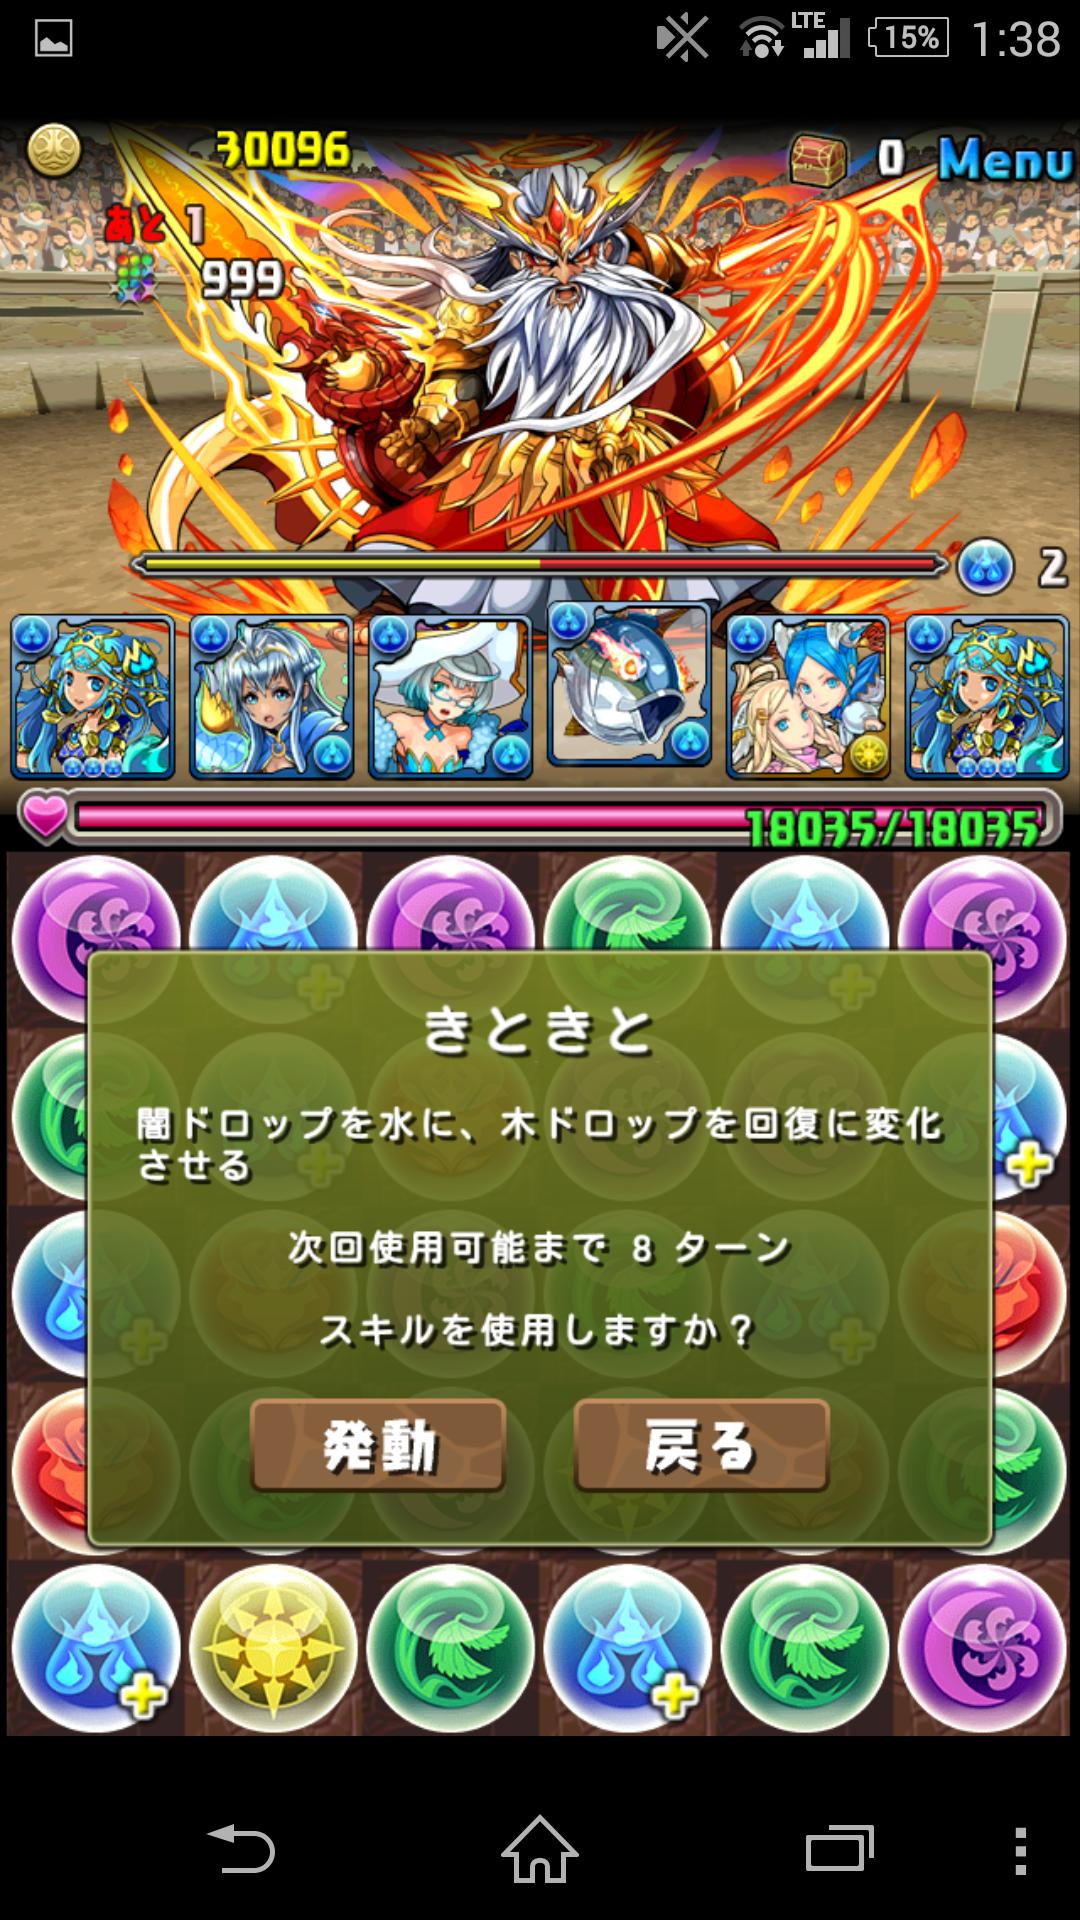 Screenshot_2015-02-12-01-38-32.png